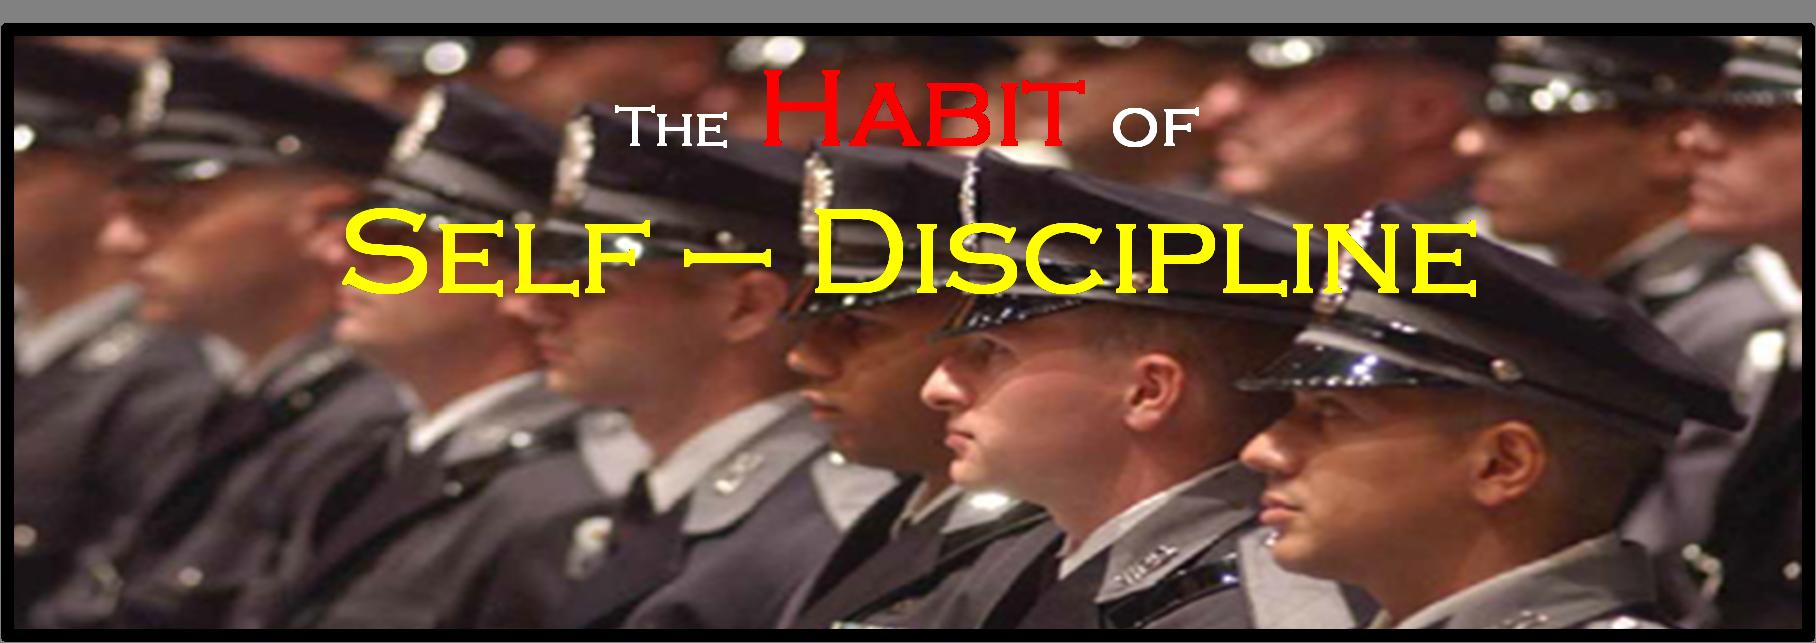 The Habit of Self Discipline @ destinylifters.com.png